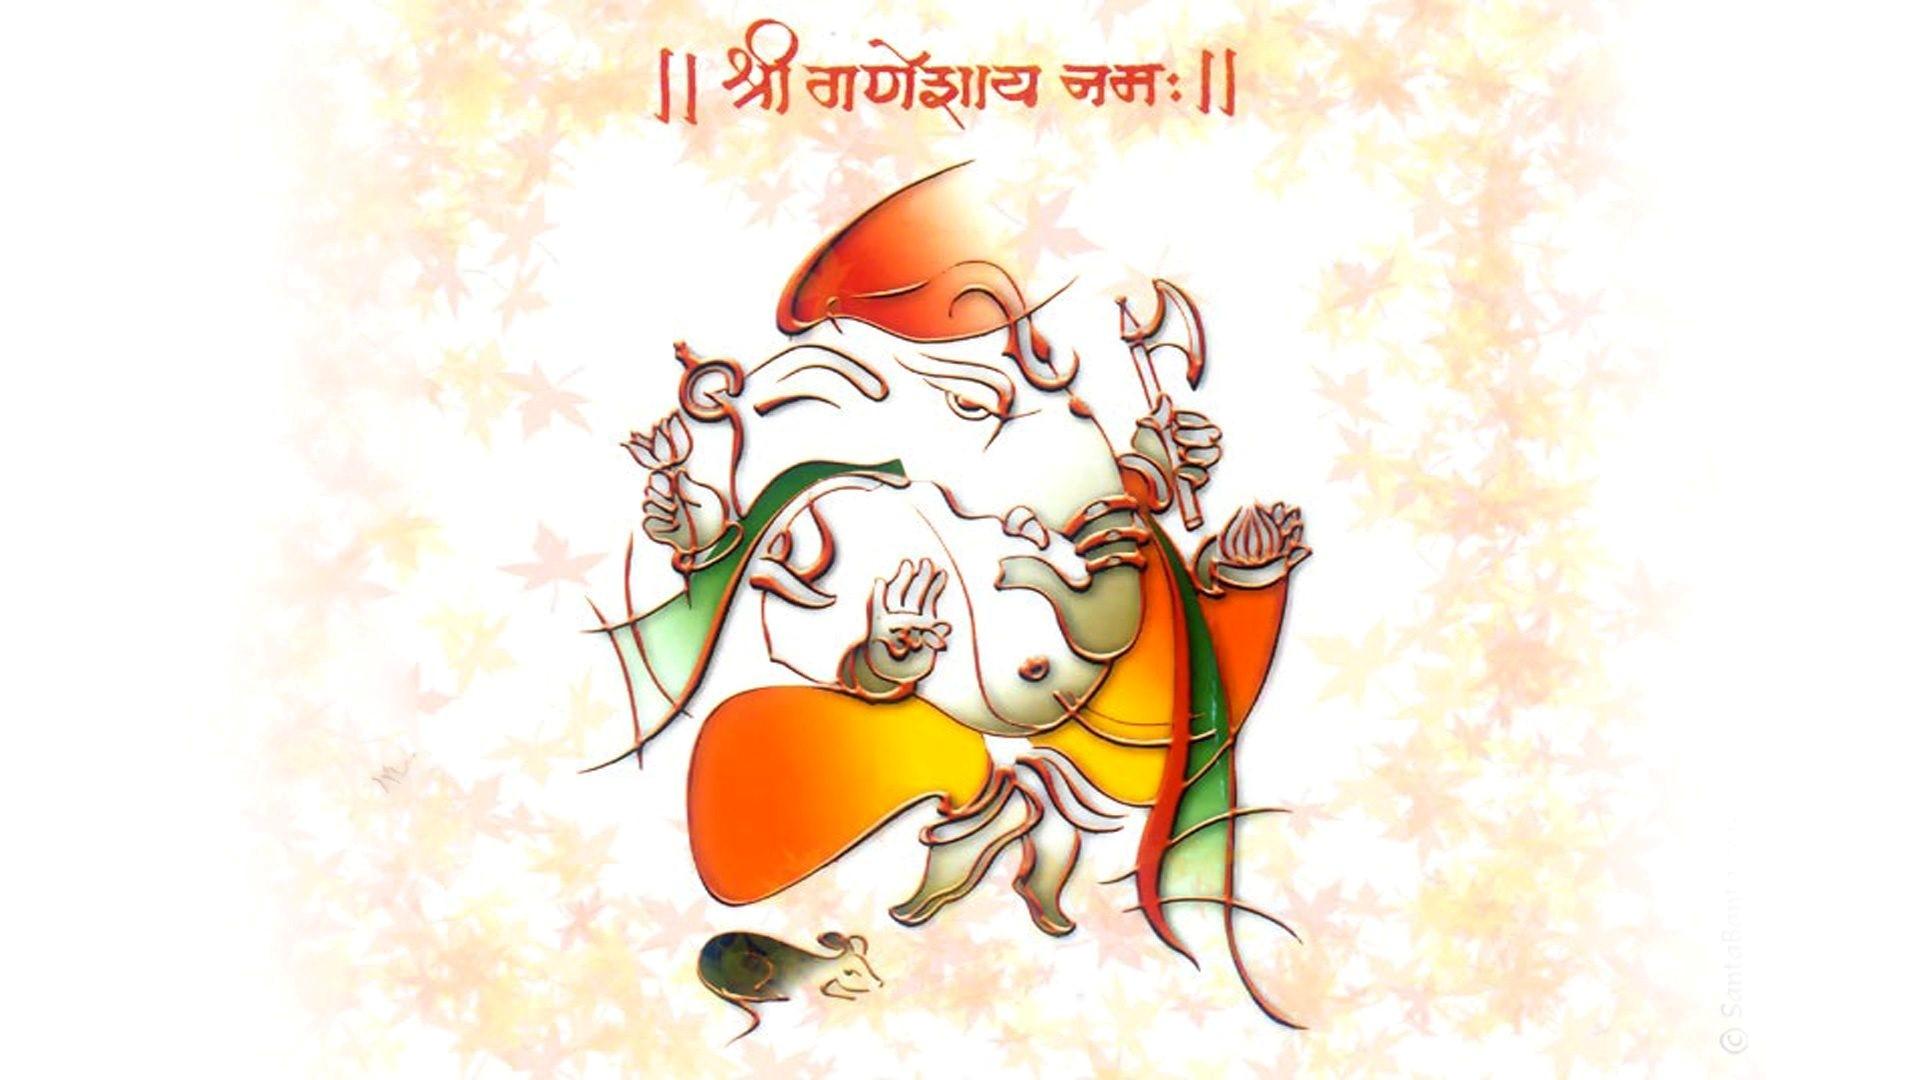 Hindu God Animation Wallpaper Free Download Hd Wallpaper For Free Download Images For Free